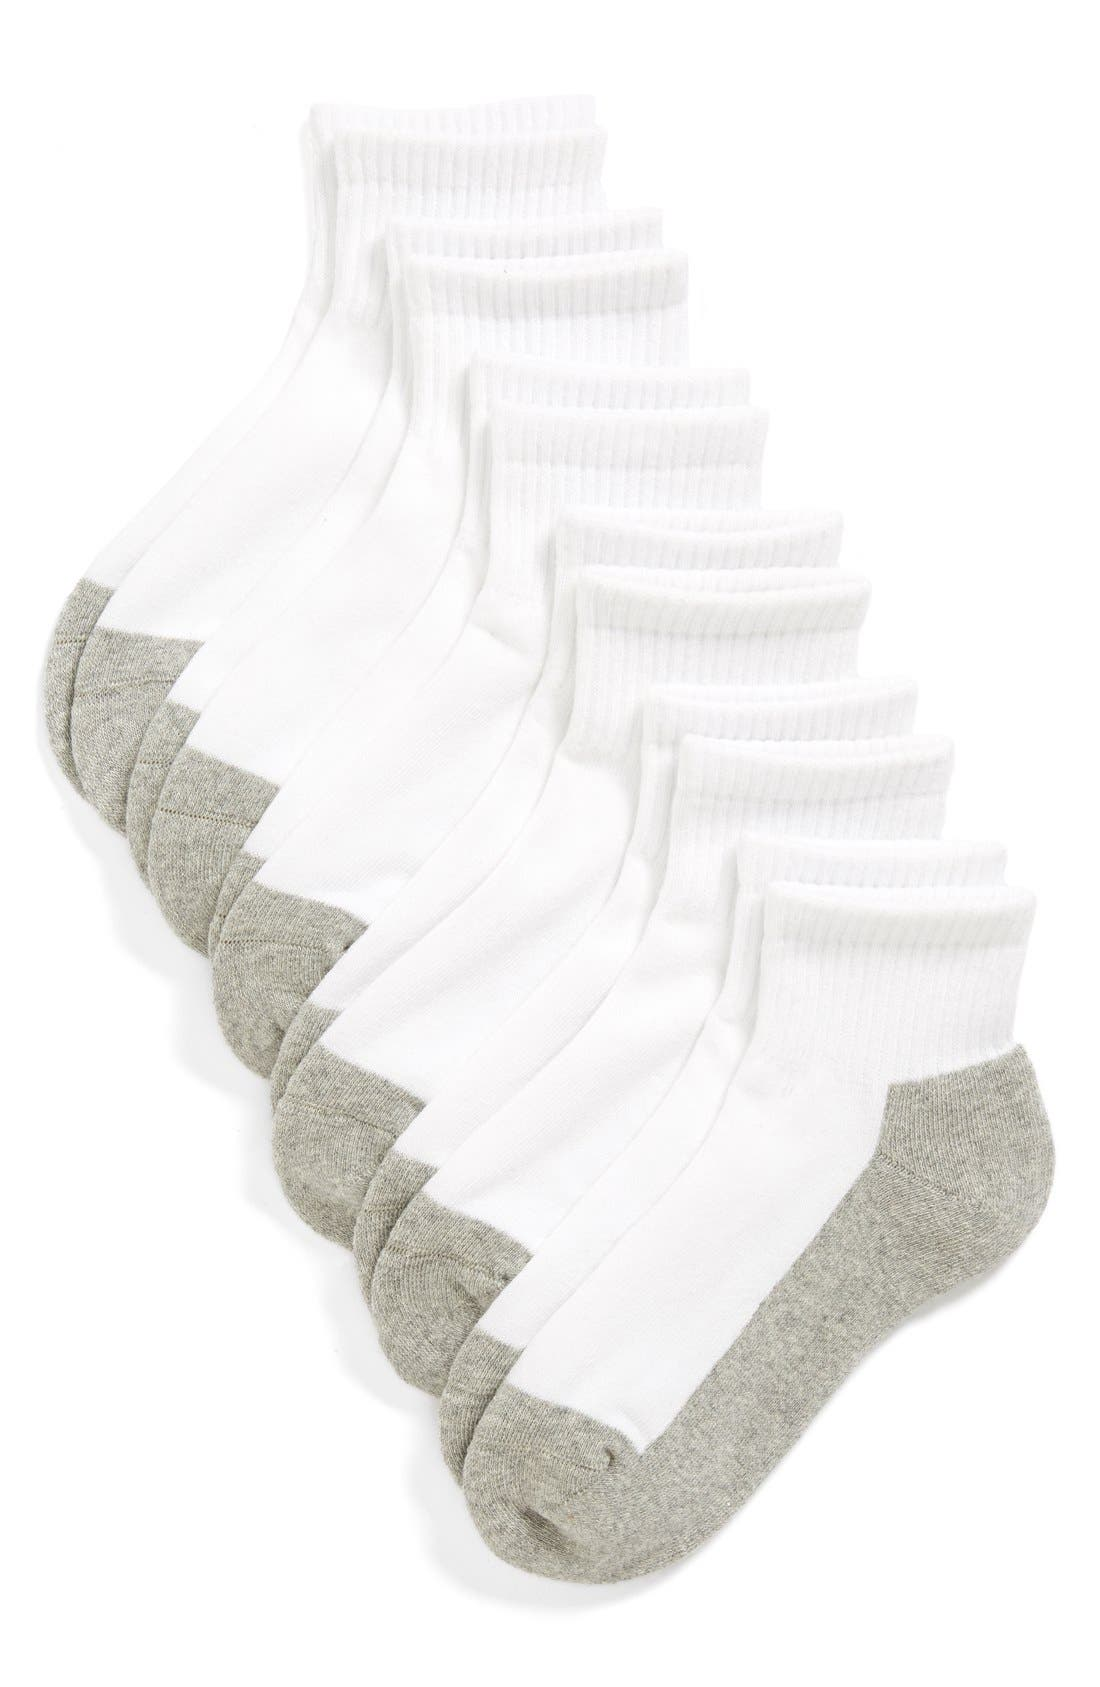 TUCKER + TATE, 6-Pack Active Quarter Socks, Main thumbnail 1, color, WHITE/ GREY